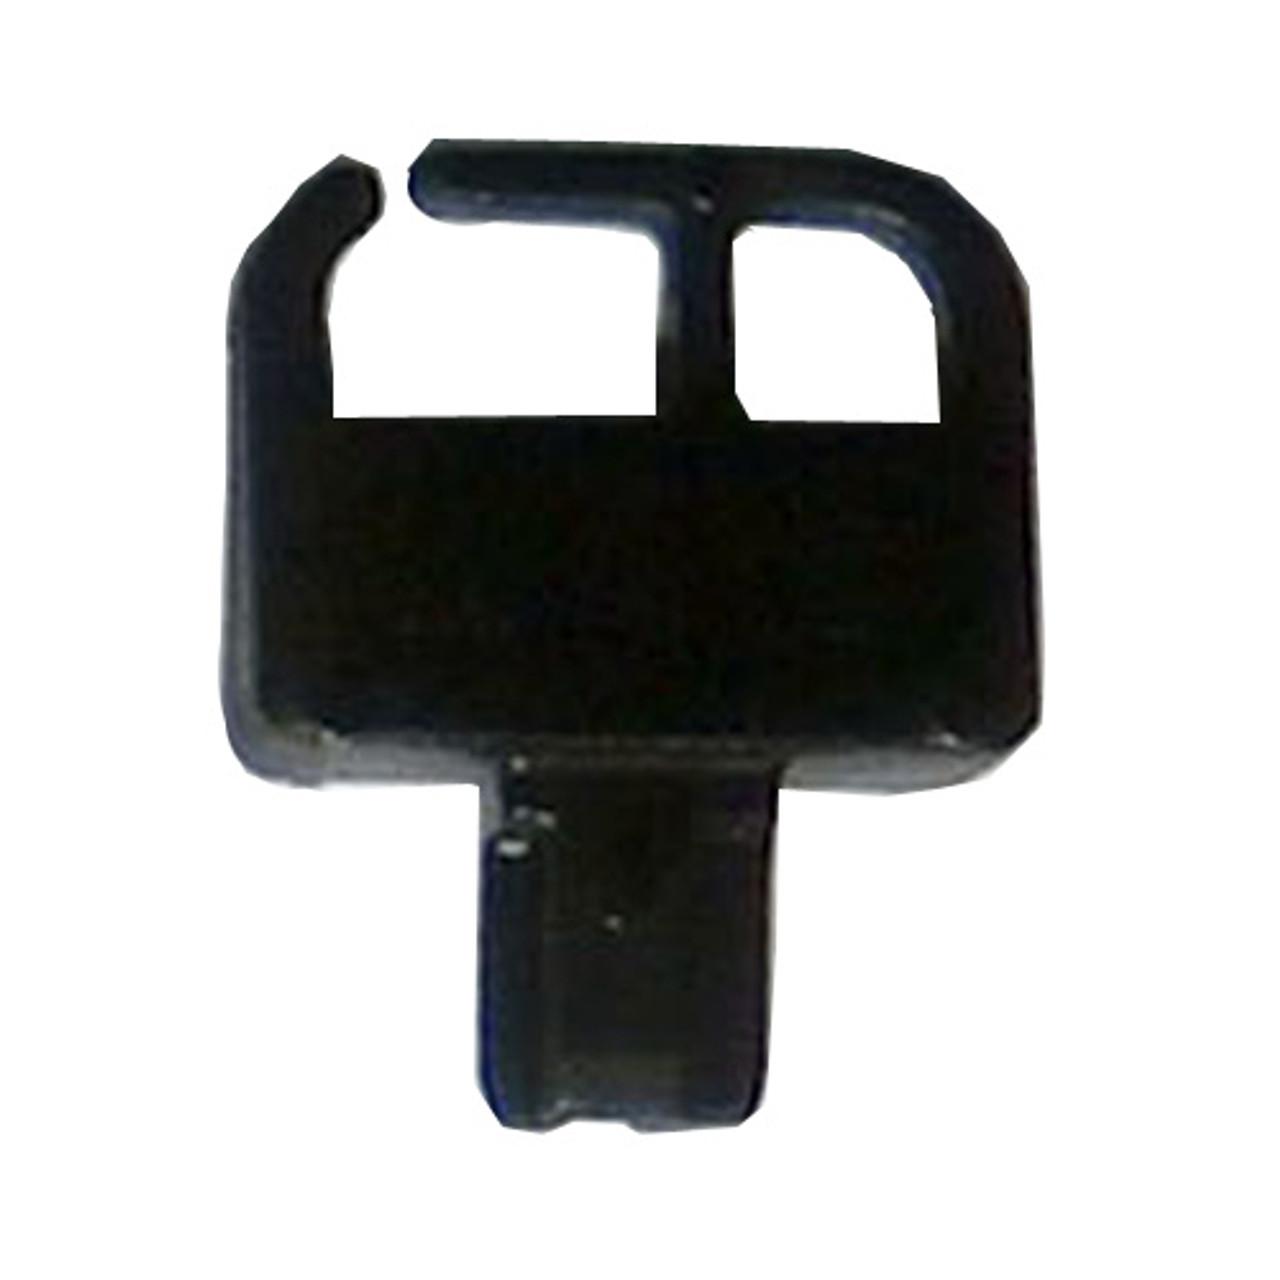 Master Spa - X900104 - Black Master Cover Lock Key